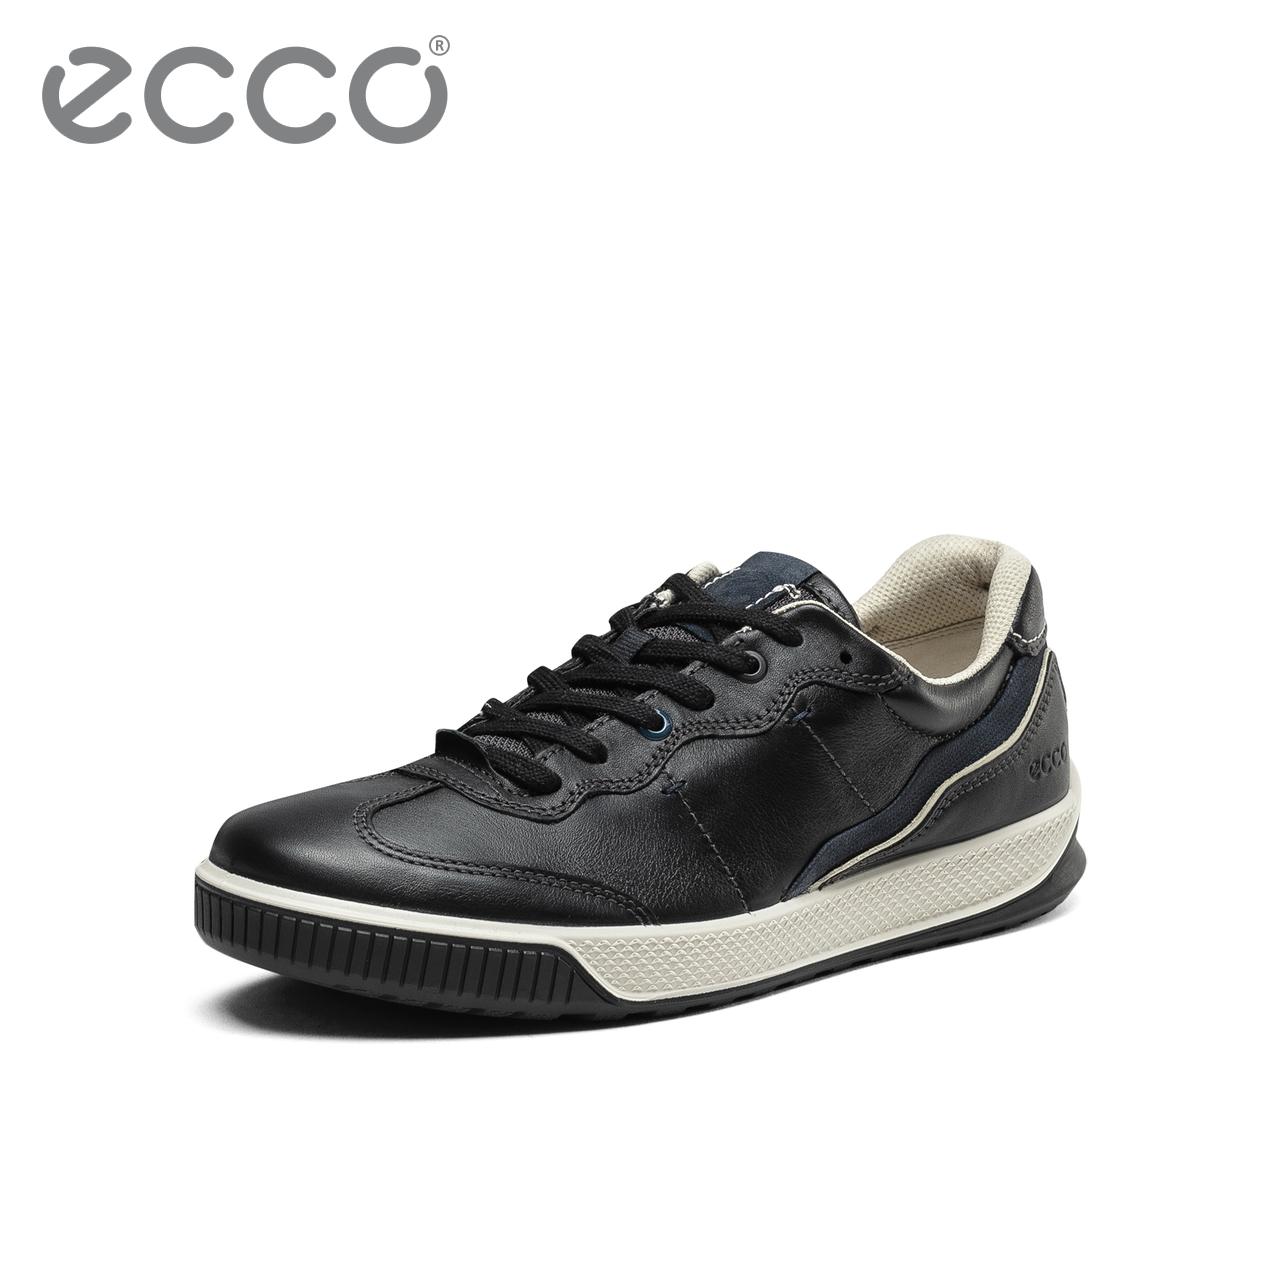 ECCO爱步时尚男运动休闲鞋潮 2019秋季新款小白鞋板鞋 路威501814